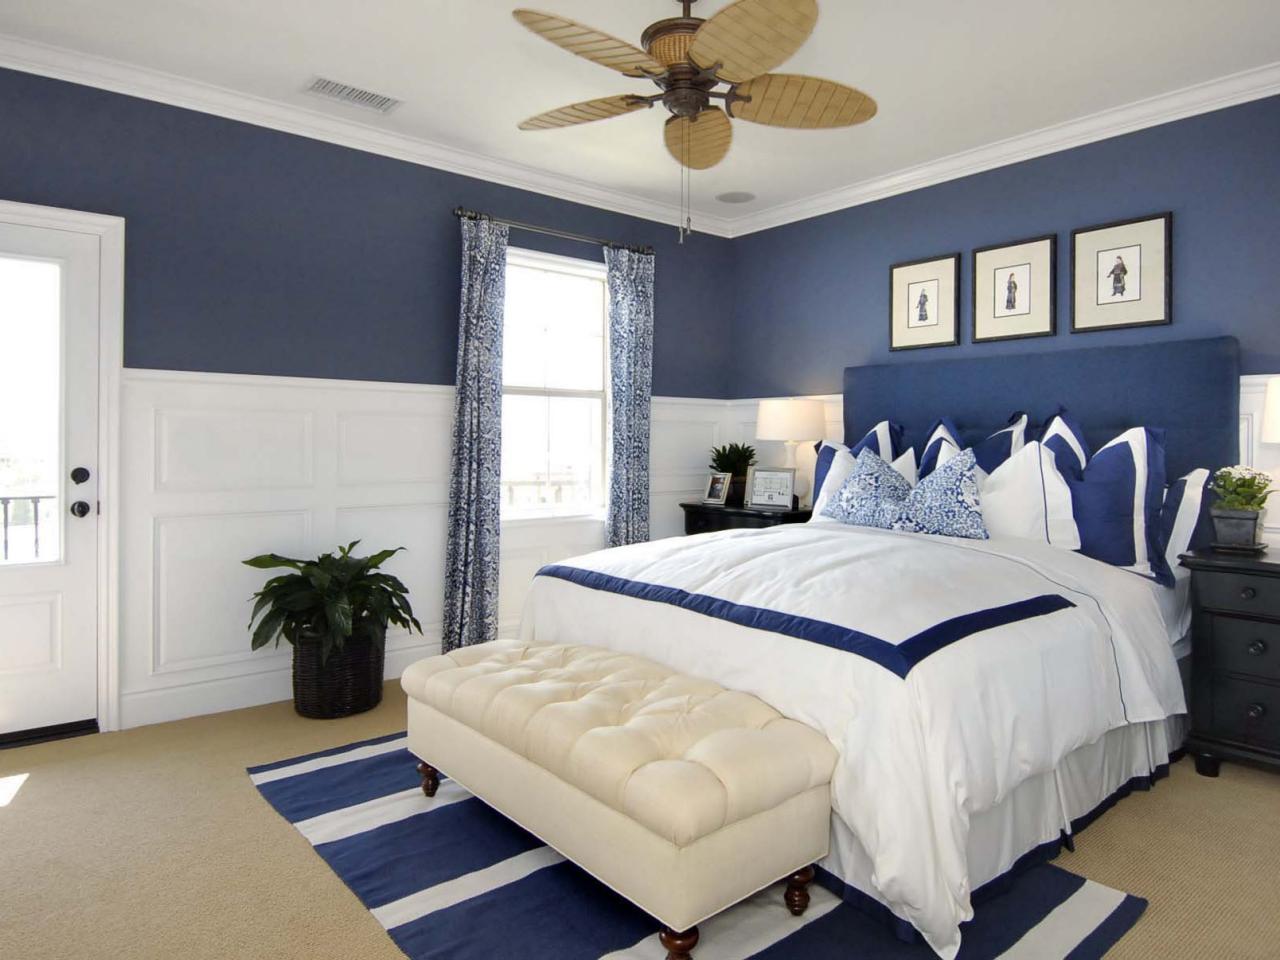 DesignLens_cobalt-blue-room_s4x3.jpg.rend.hgtvcom.1280.960